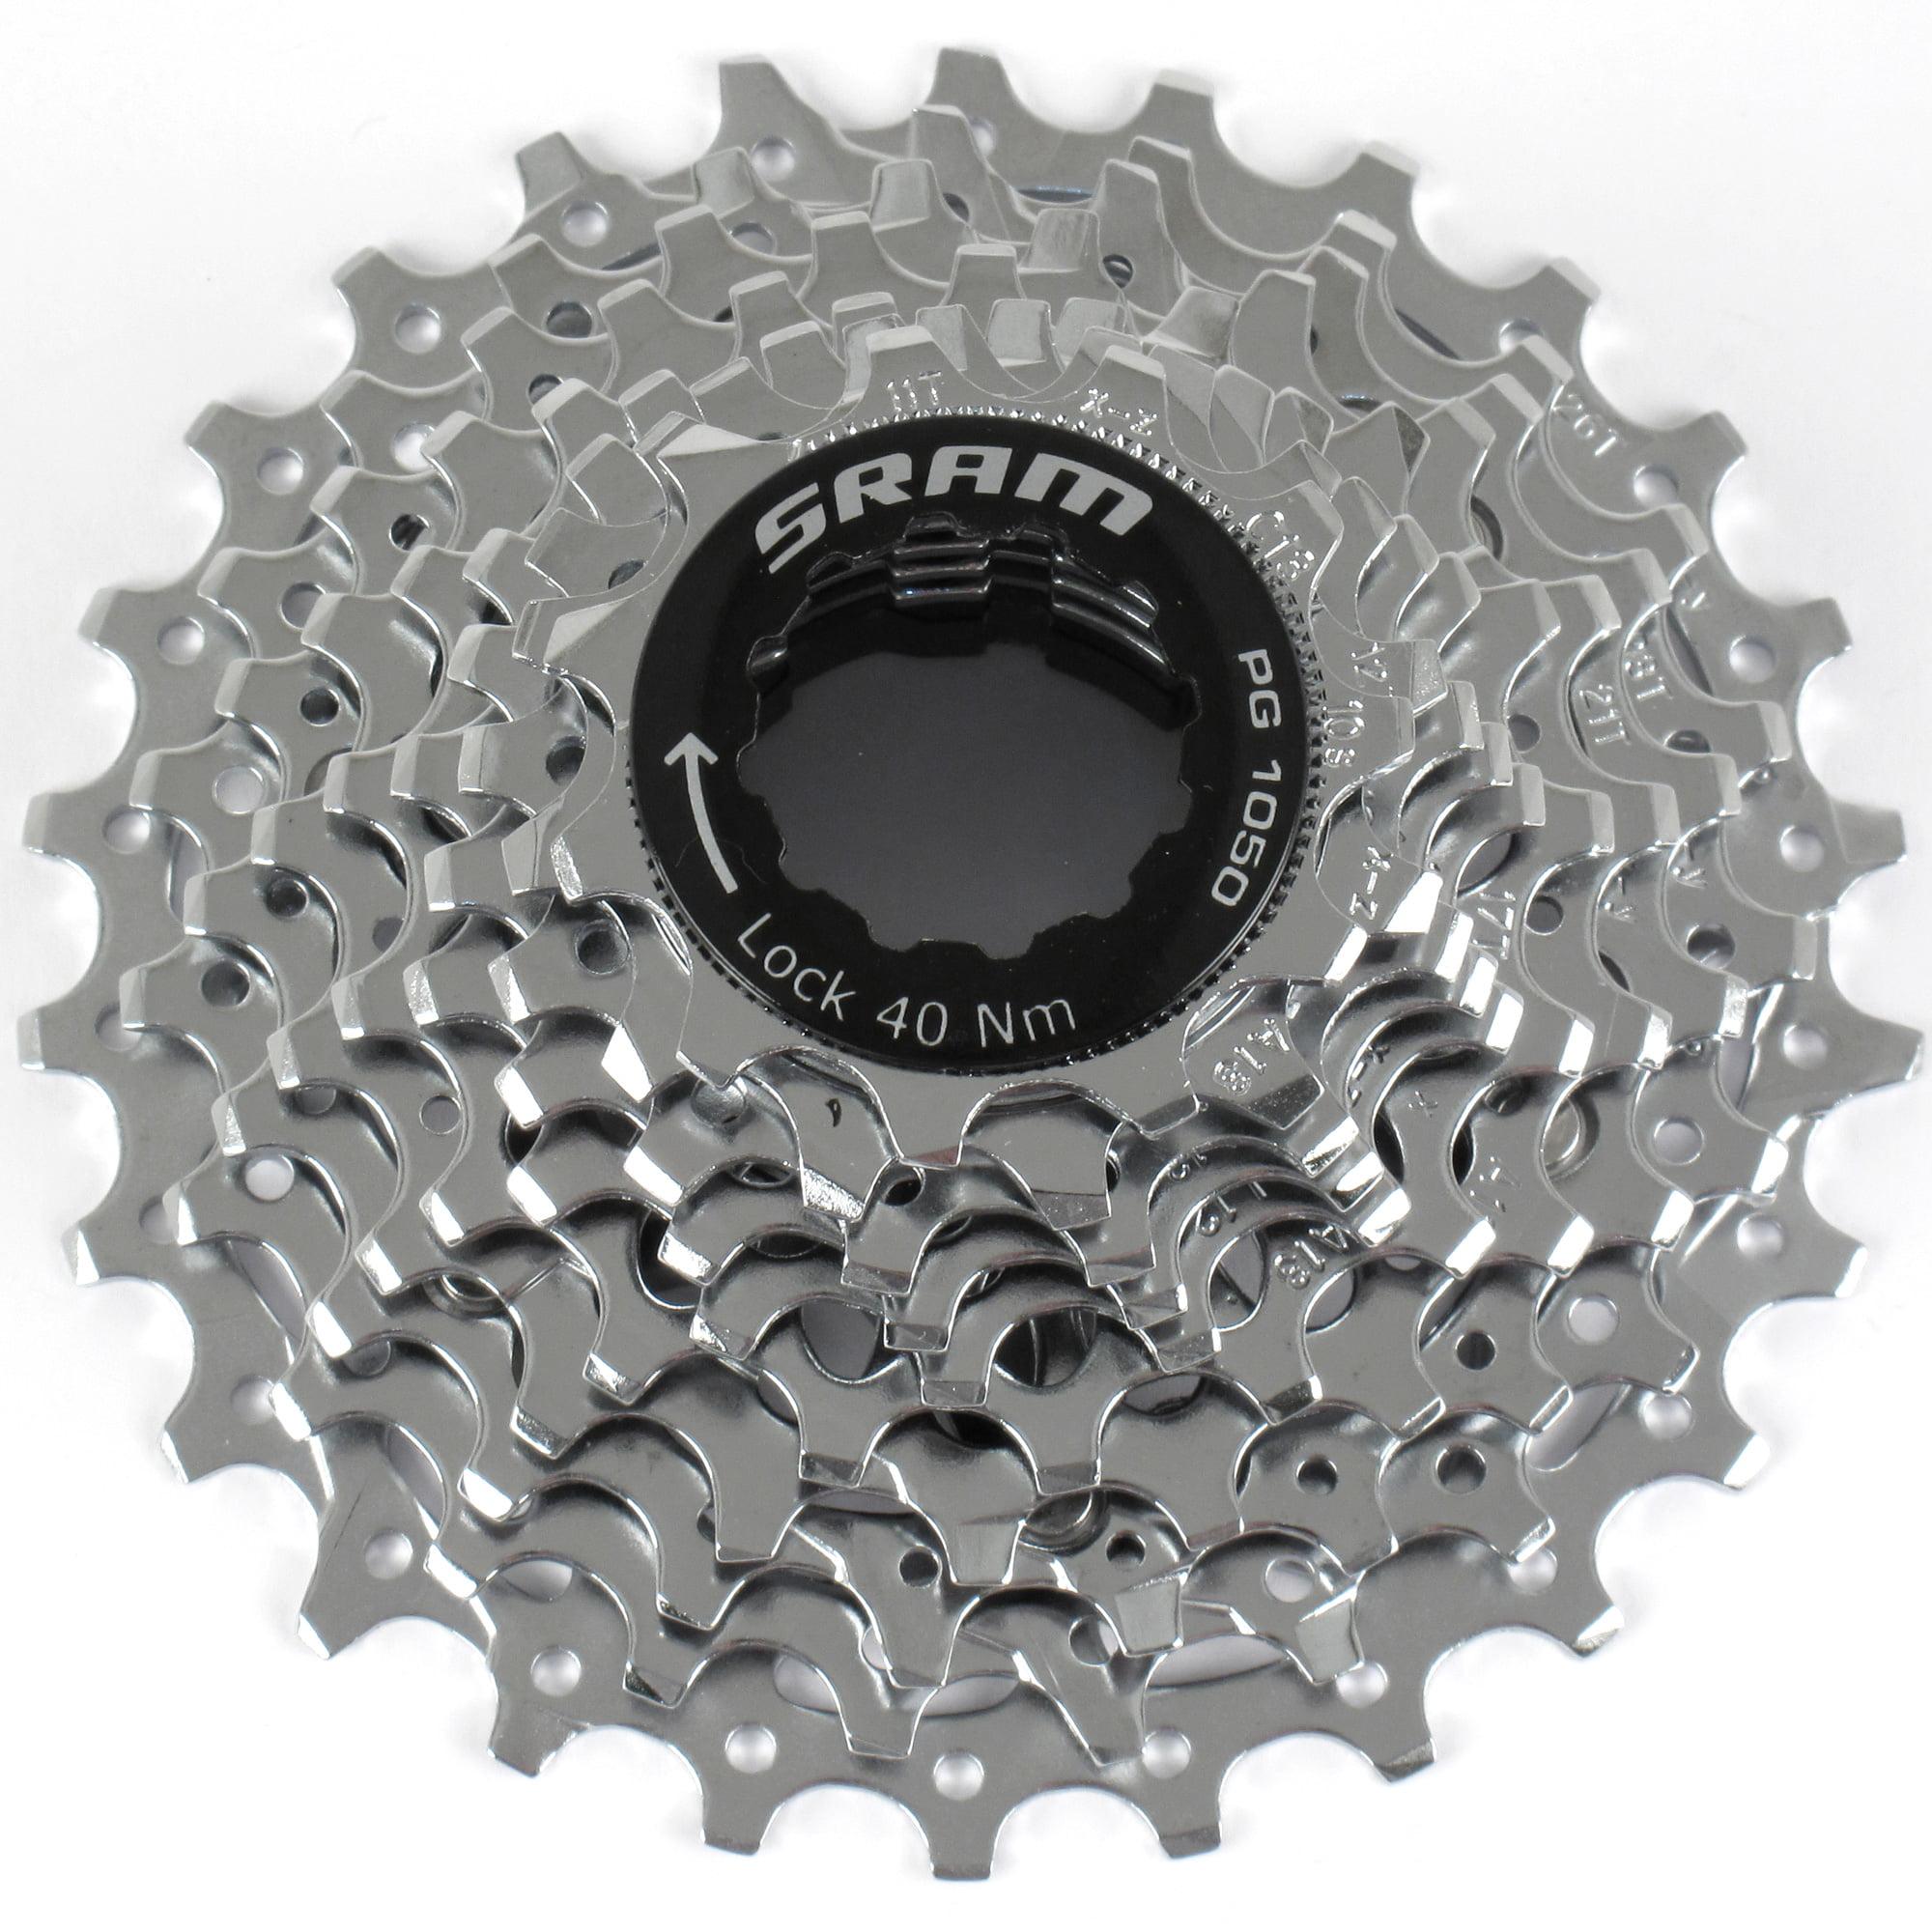 SRAM PG-1050 11-26 10-Speed Road MTB Bike Cassette 11-26T fits SRAM /& Shimano